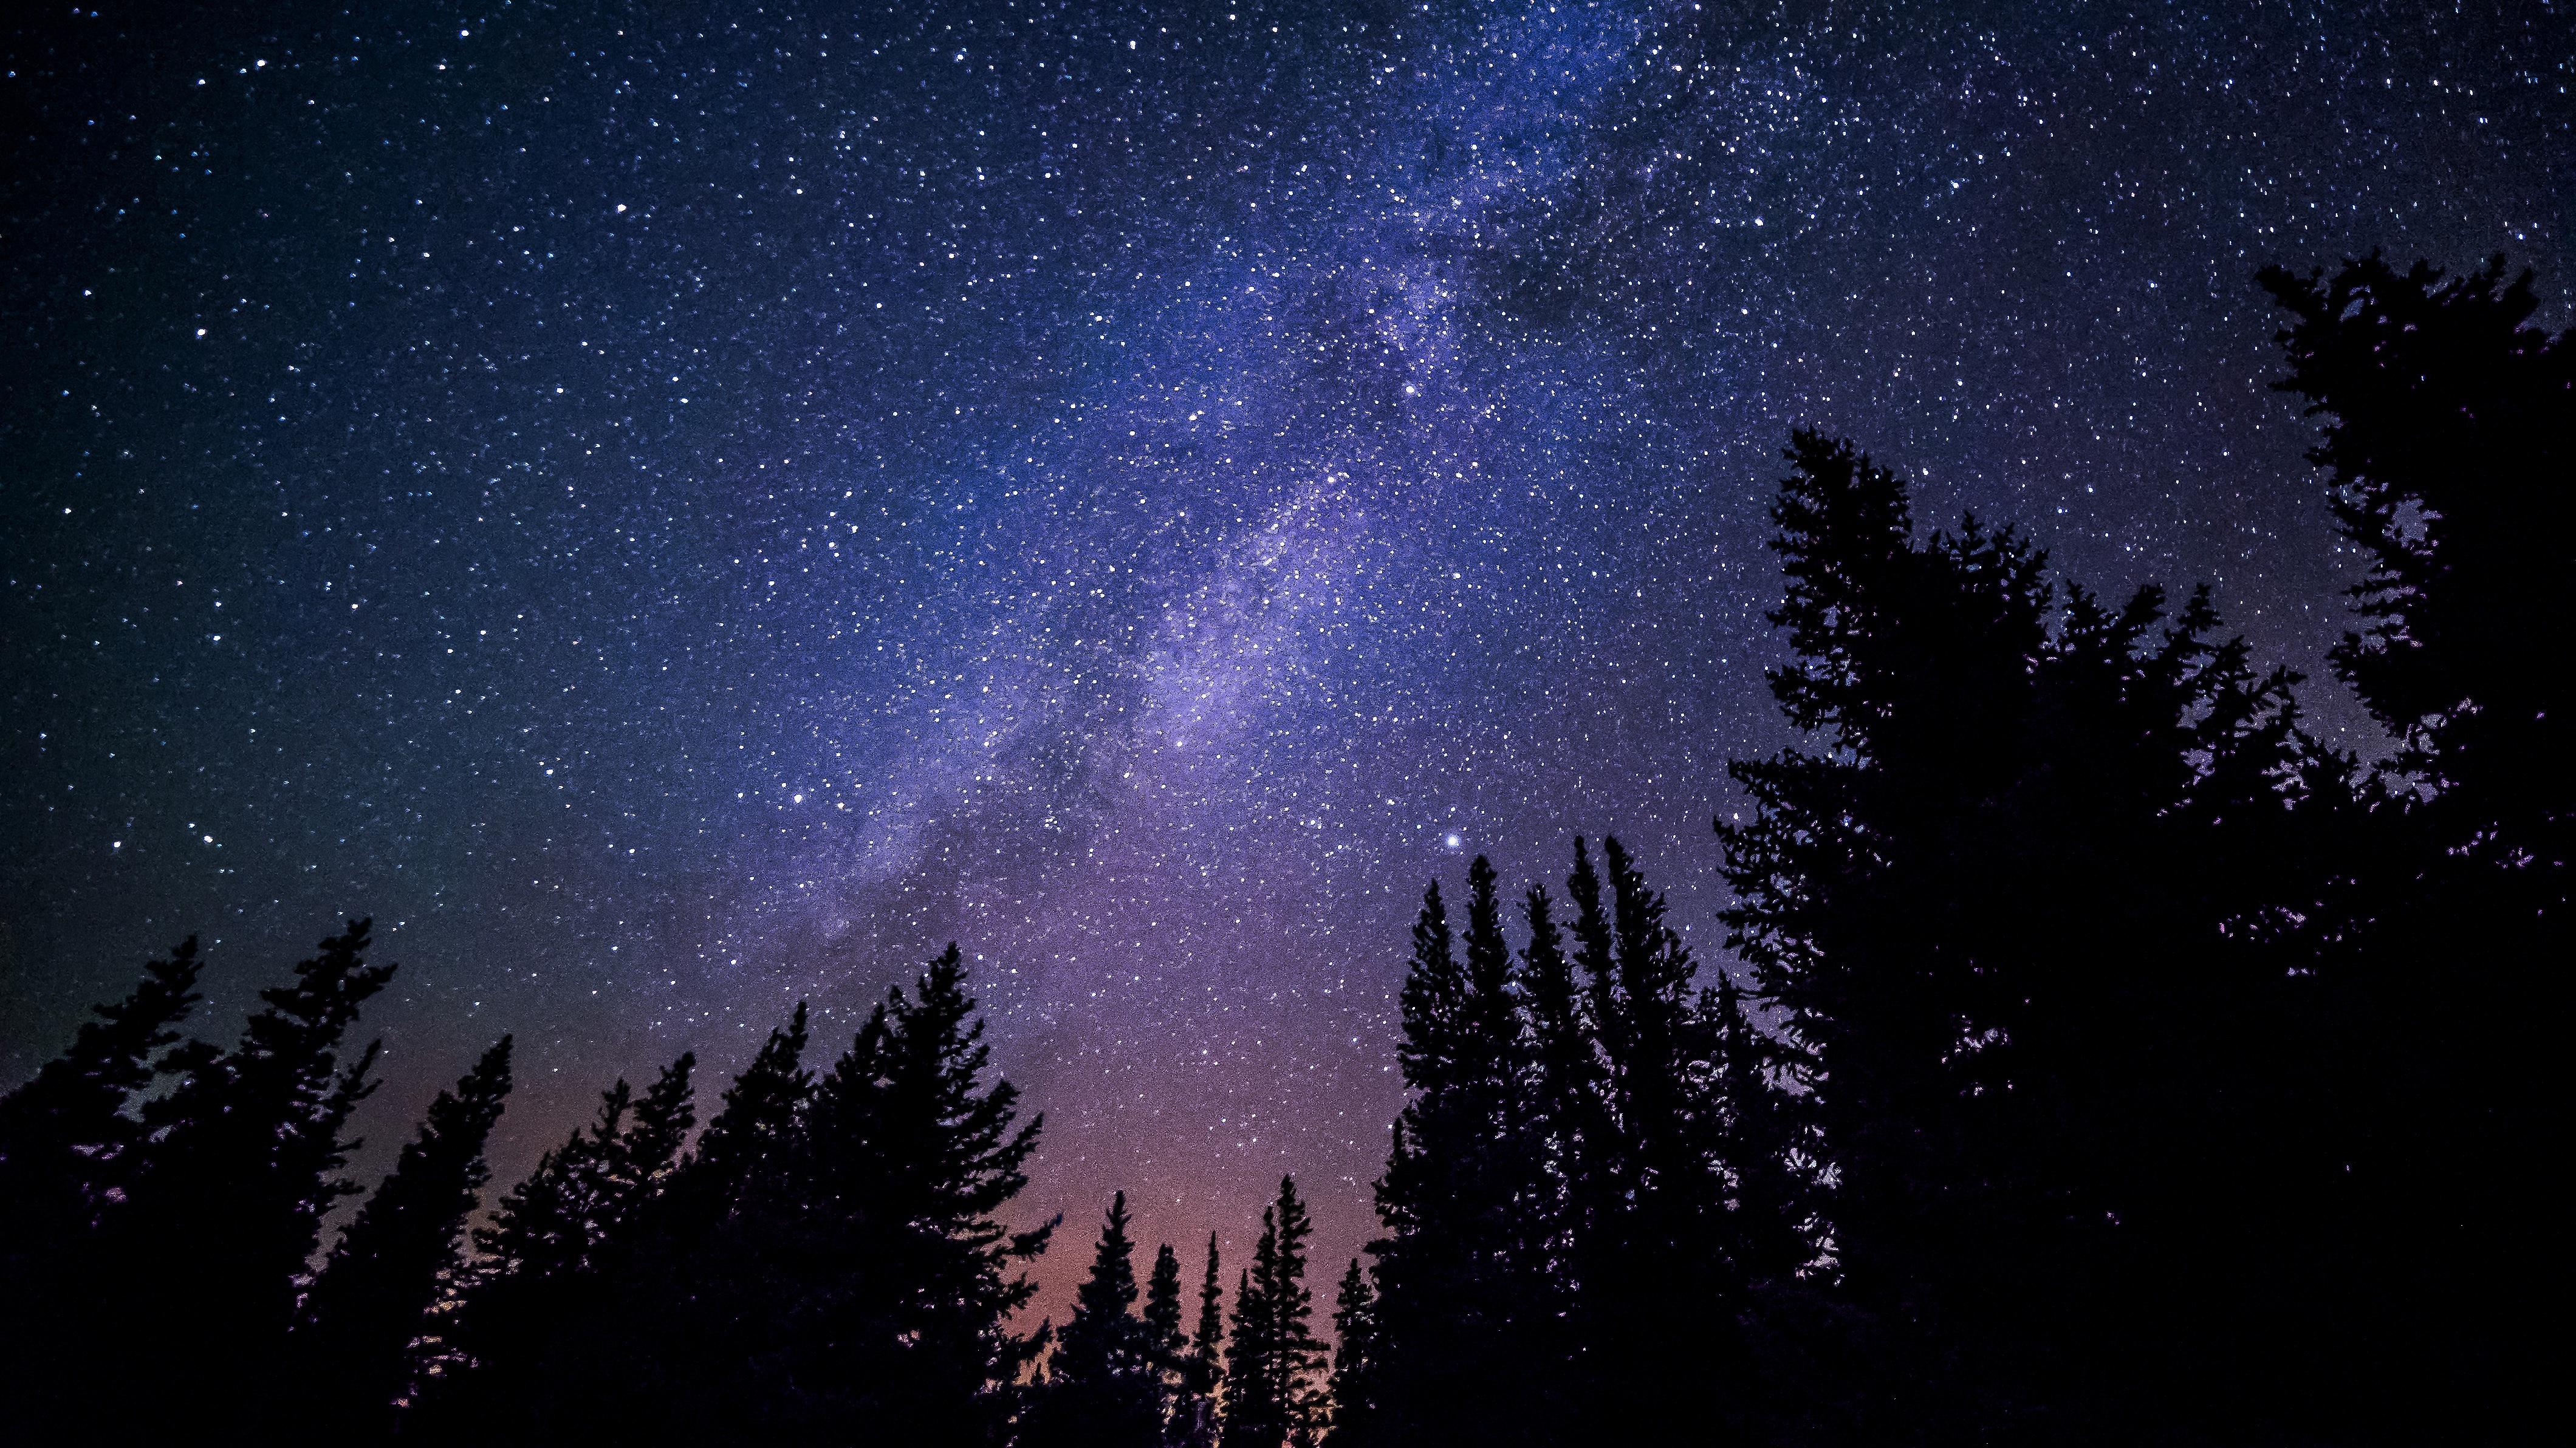 Night Sky Stars Hd Background